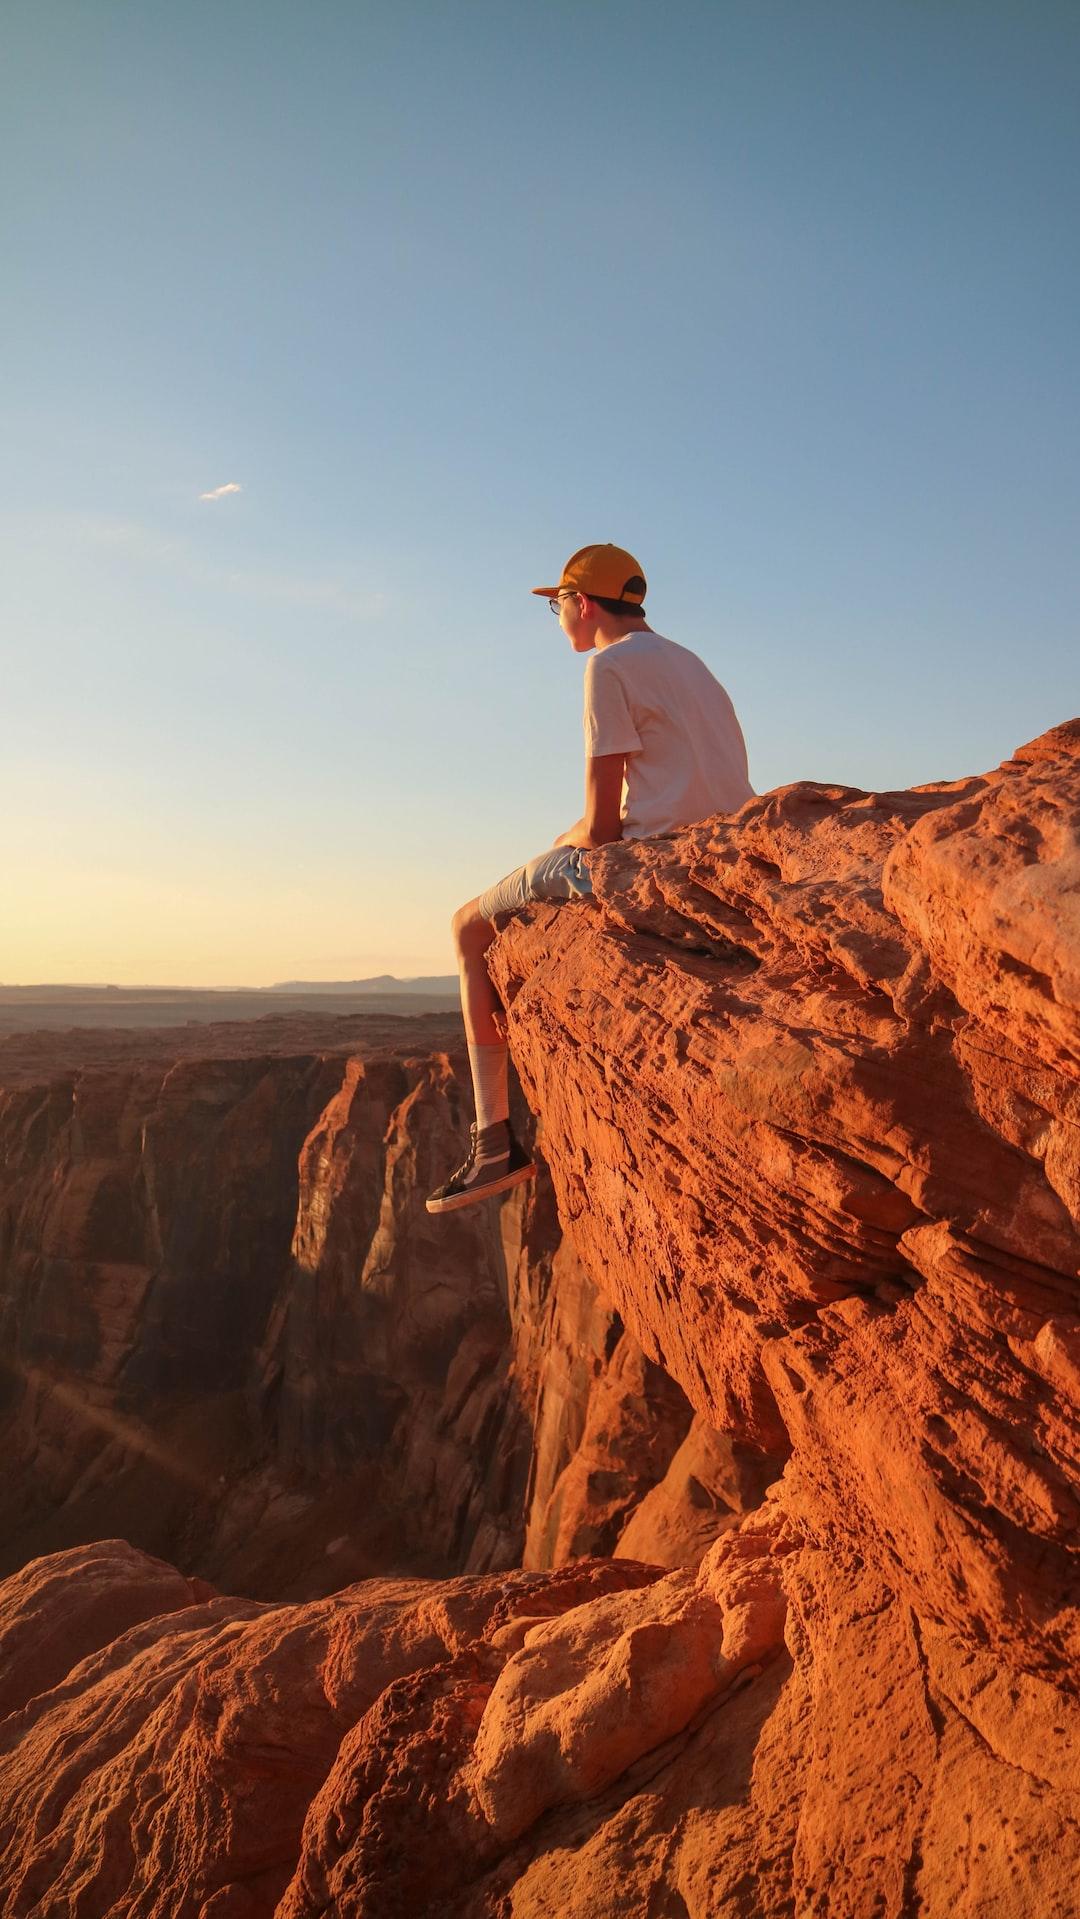 Boy dangling legs off cliff